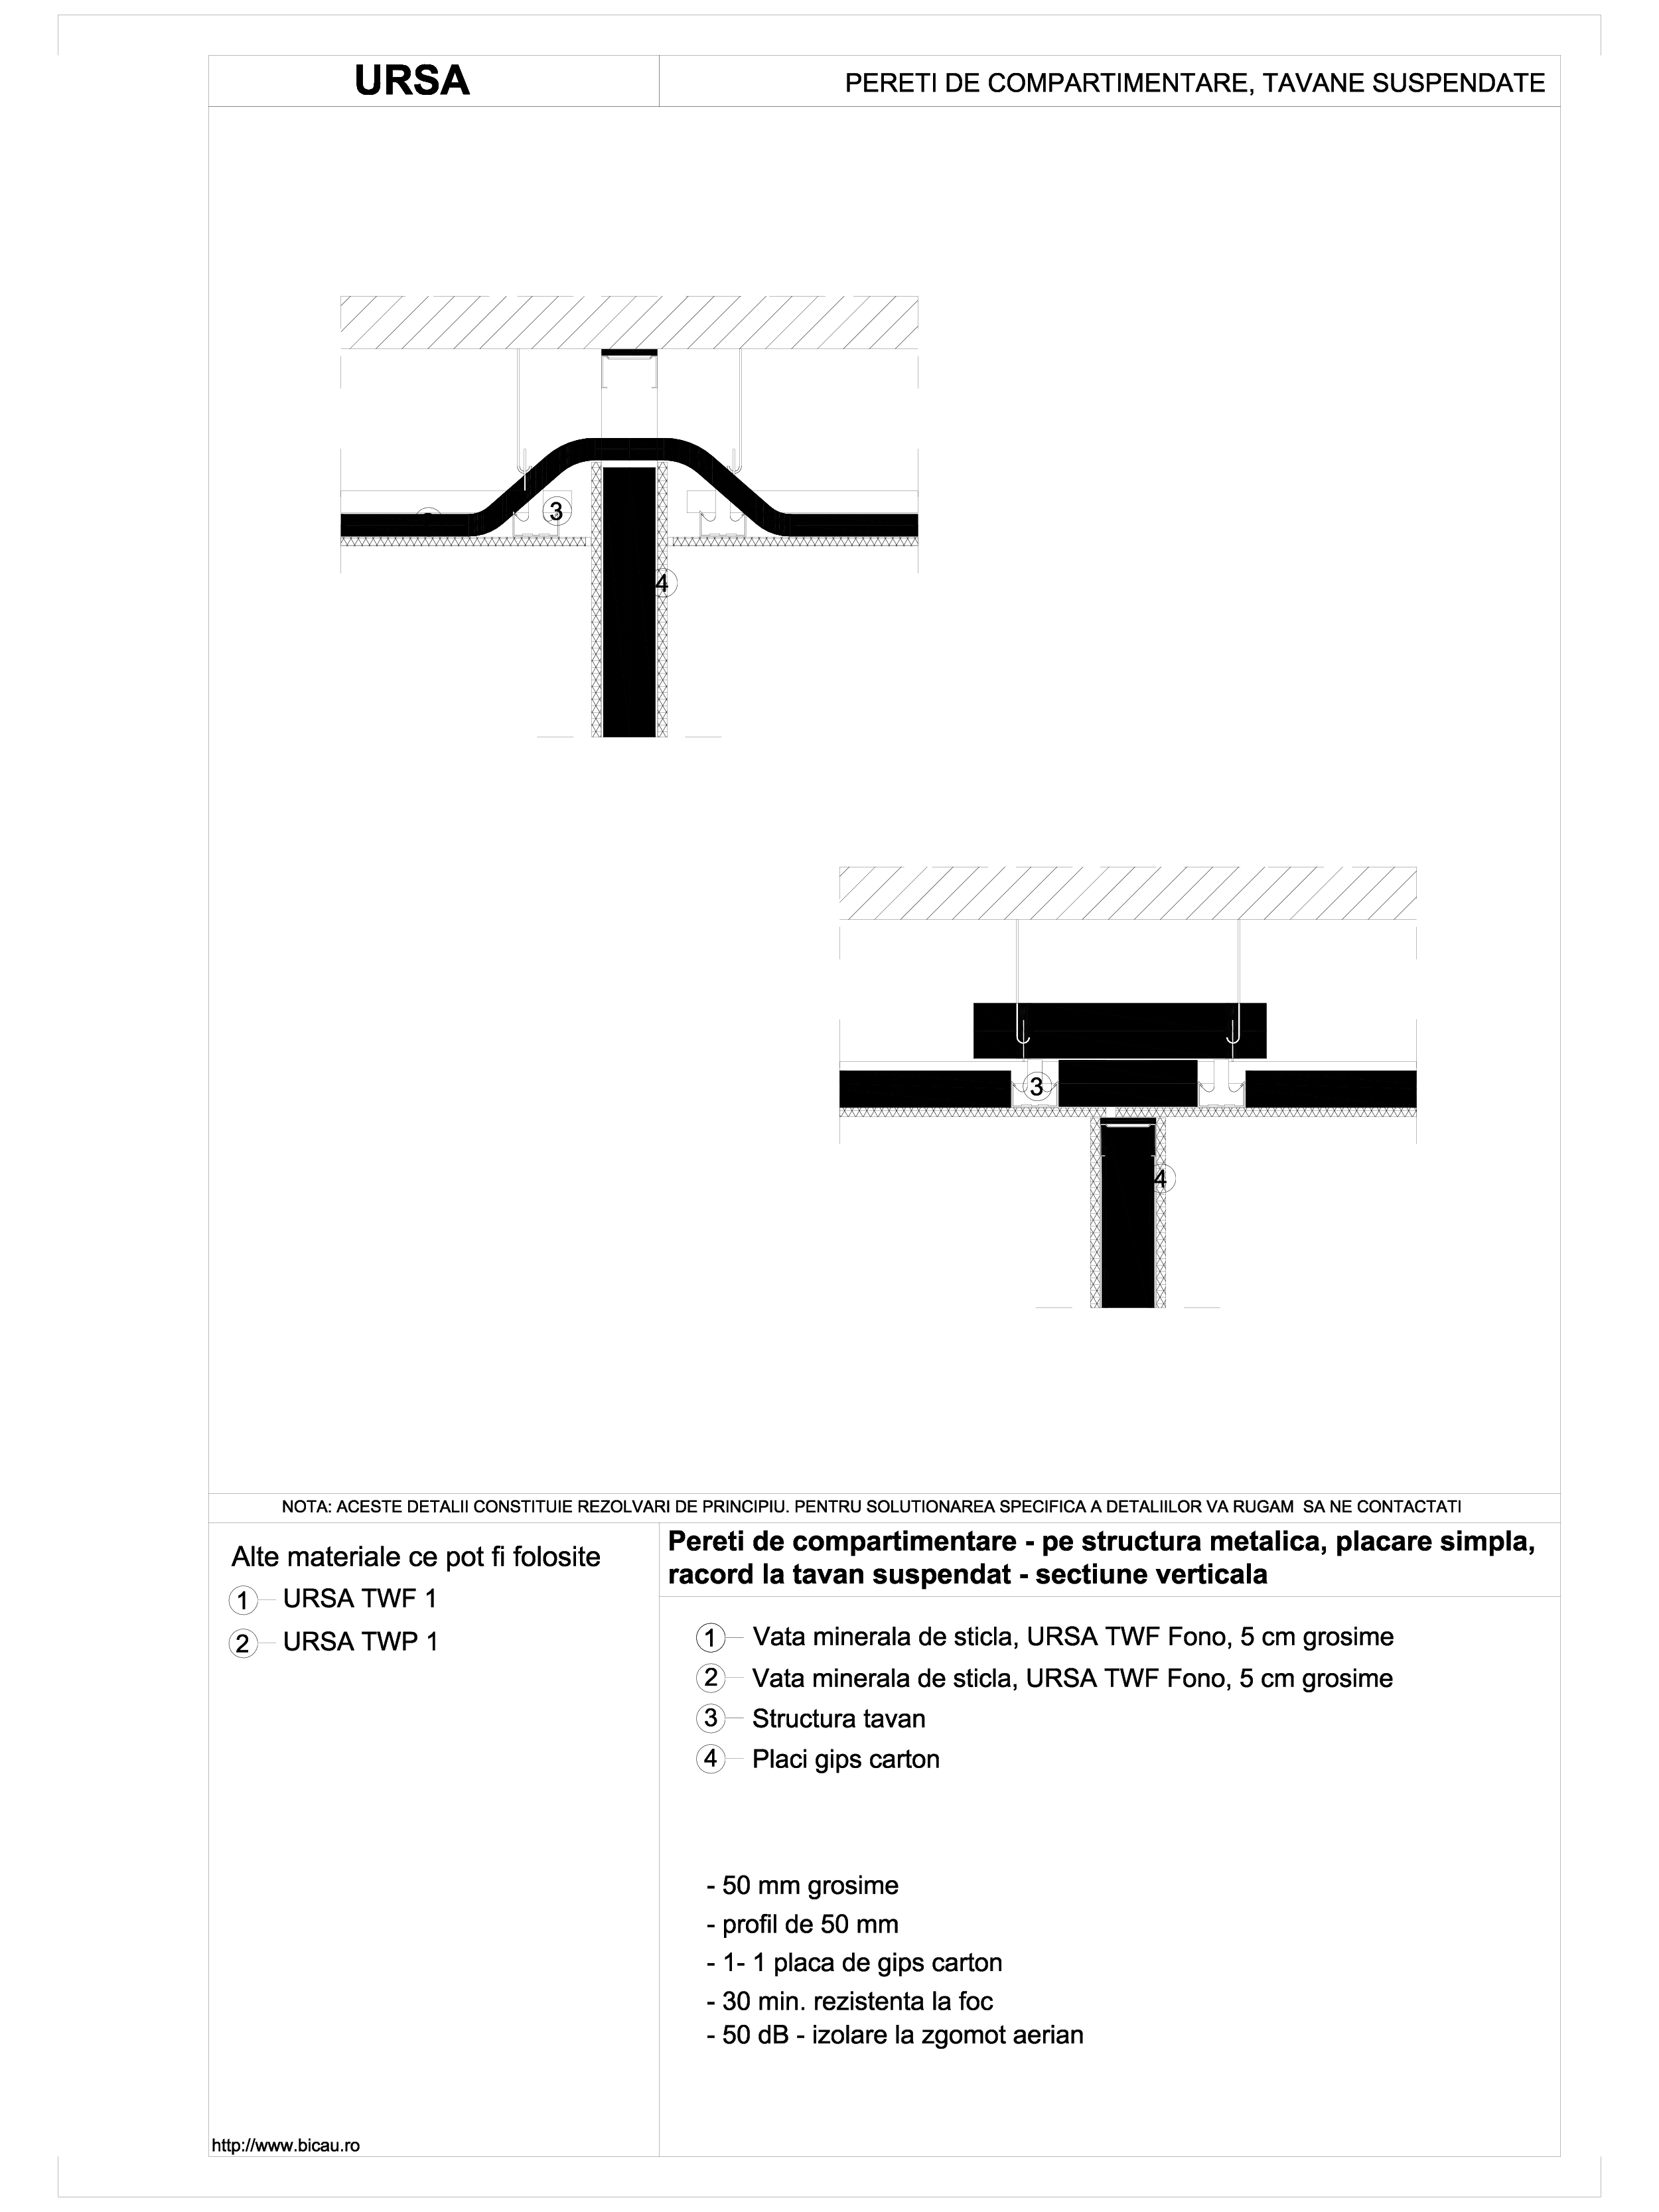 Pereti de compartimentare - pe structura metalica, placare simpla, racord la tavan suspendat - sectiune verticala TWF FONO URSA Vata minerala pentru pereti de compartimentare URSA ROMANIA   - Pagina 1